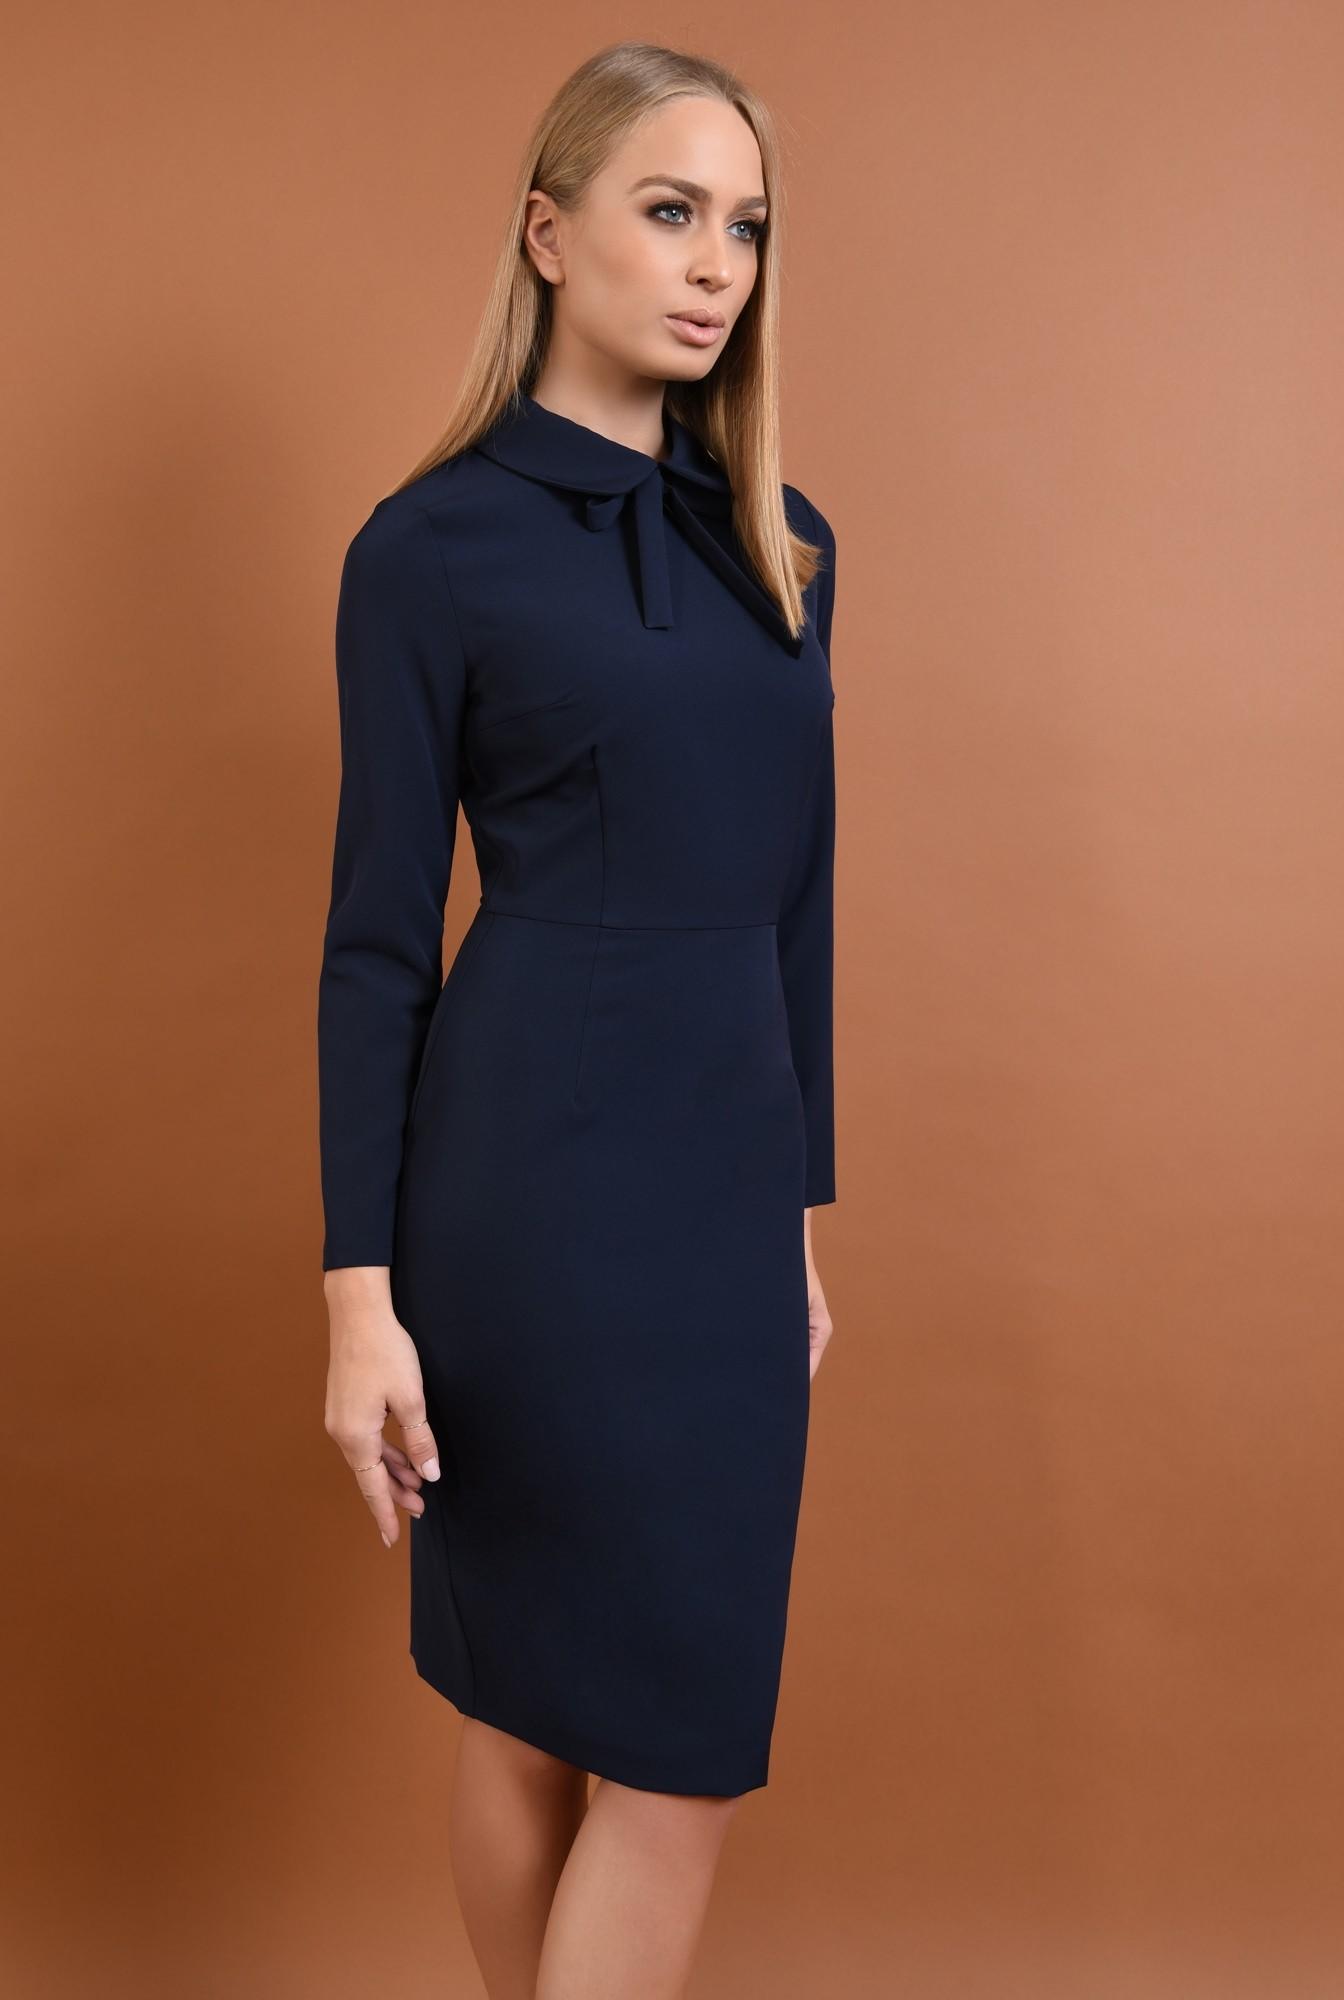 0 - 360 - rochie casual, bleumarin, rochie creion, bodycon, guler rotunjit, funda